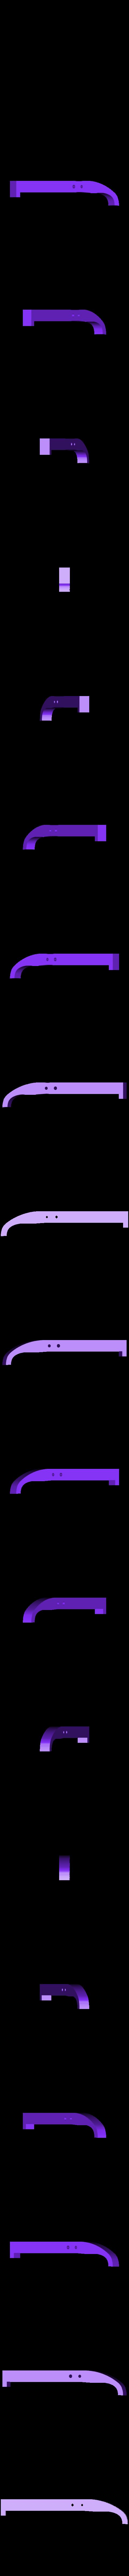 017_Harkonnen_Trigger.stl Download free OBJ file Hellsing ARMS Anti-Tank Cannon - Harkonnen - Airsoft grenade launcher • 3D printing design, Snorri